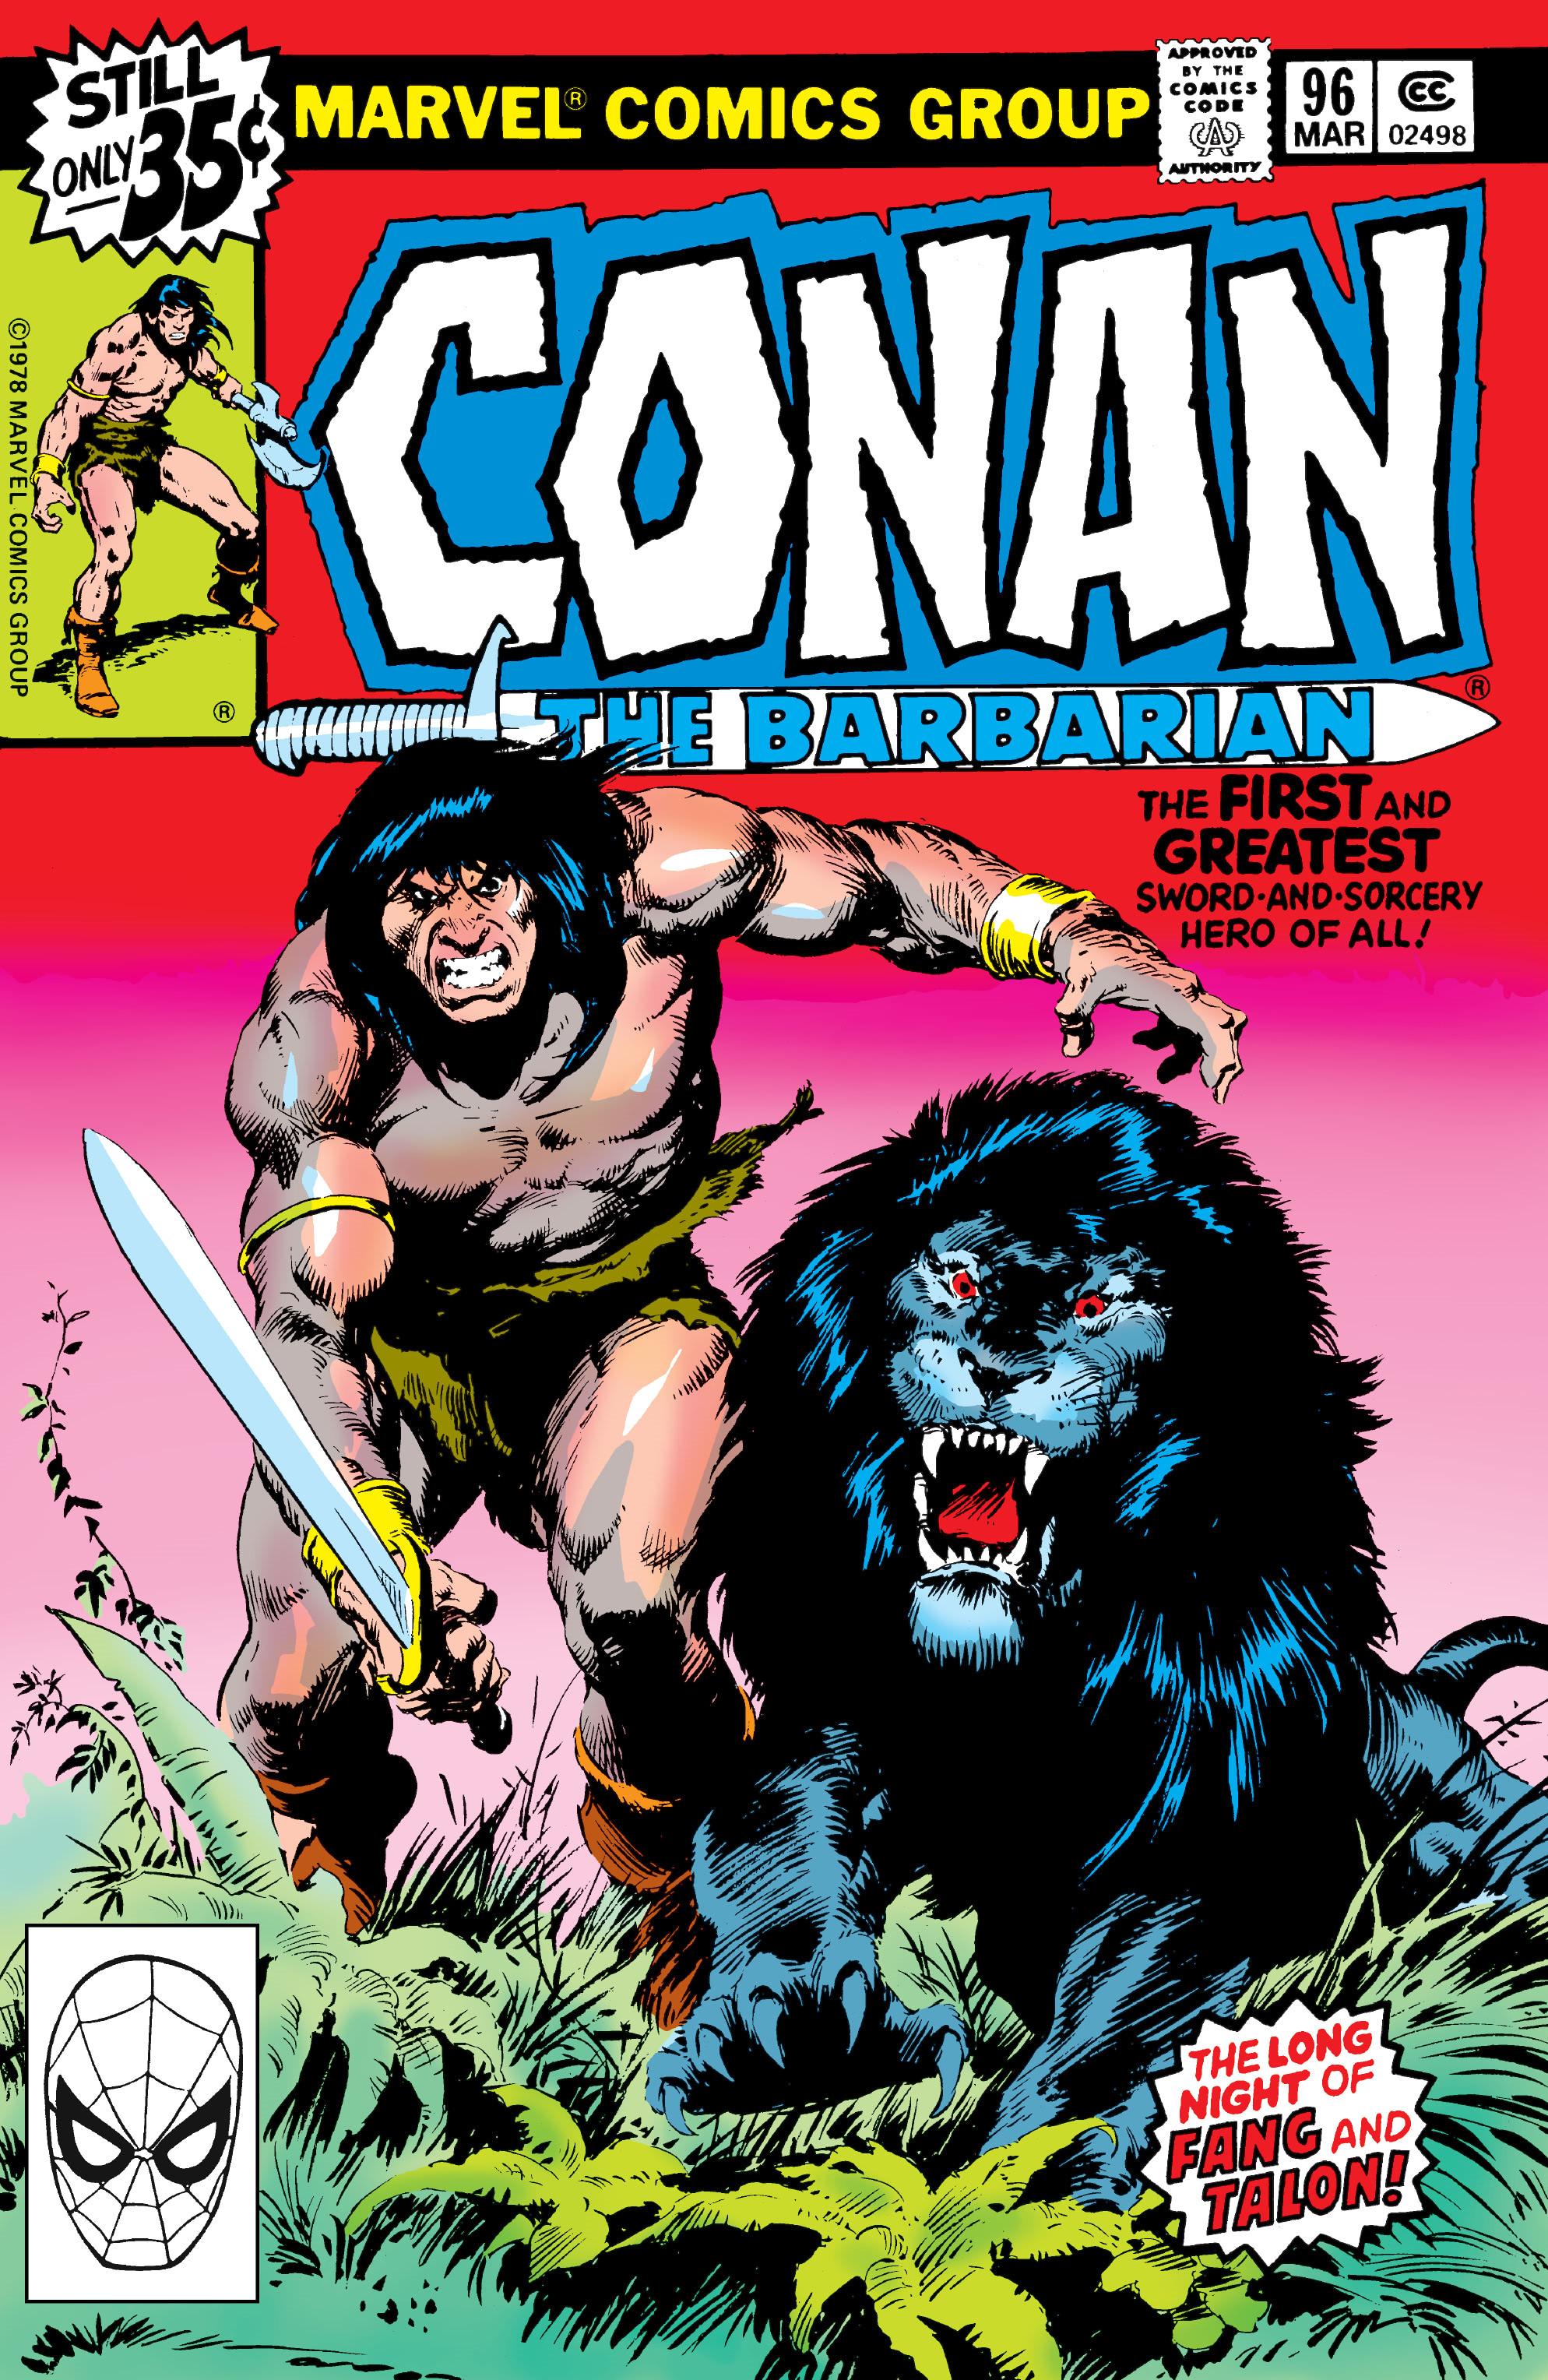 Conan the Barbarian Vol 1 96